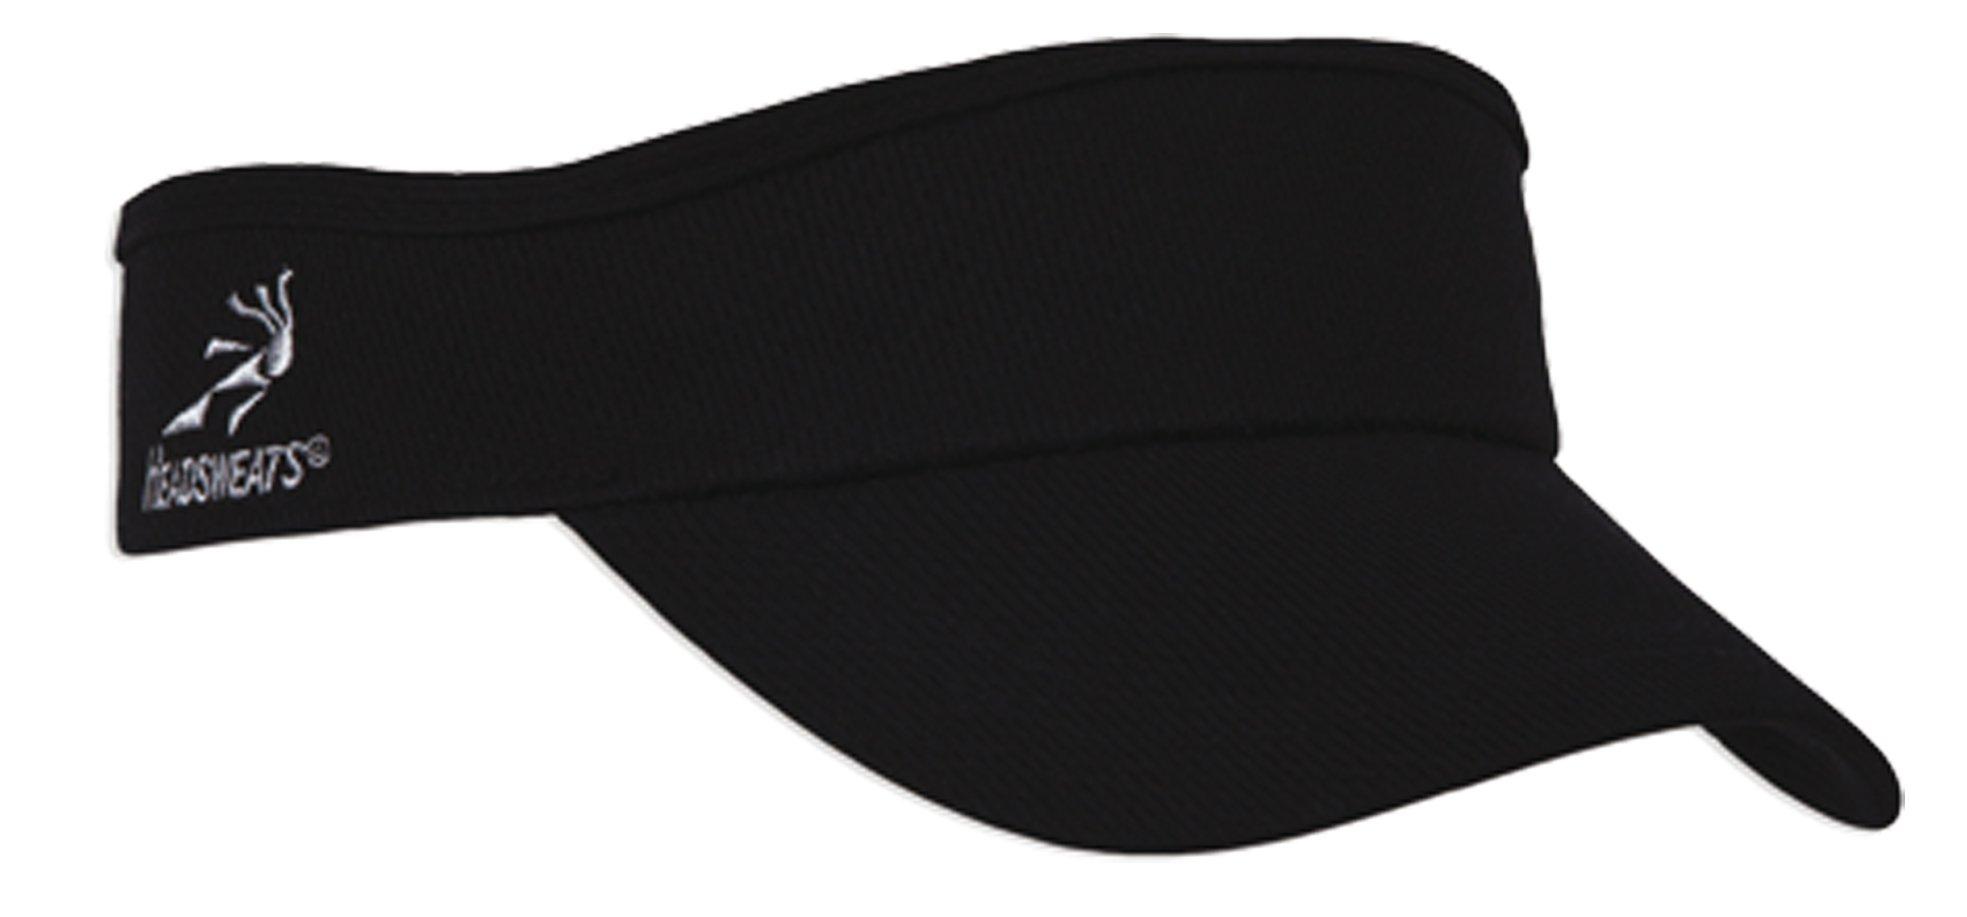 Headsweats Velocity Visor, Black,One Size